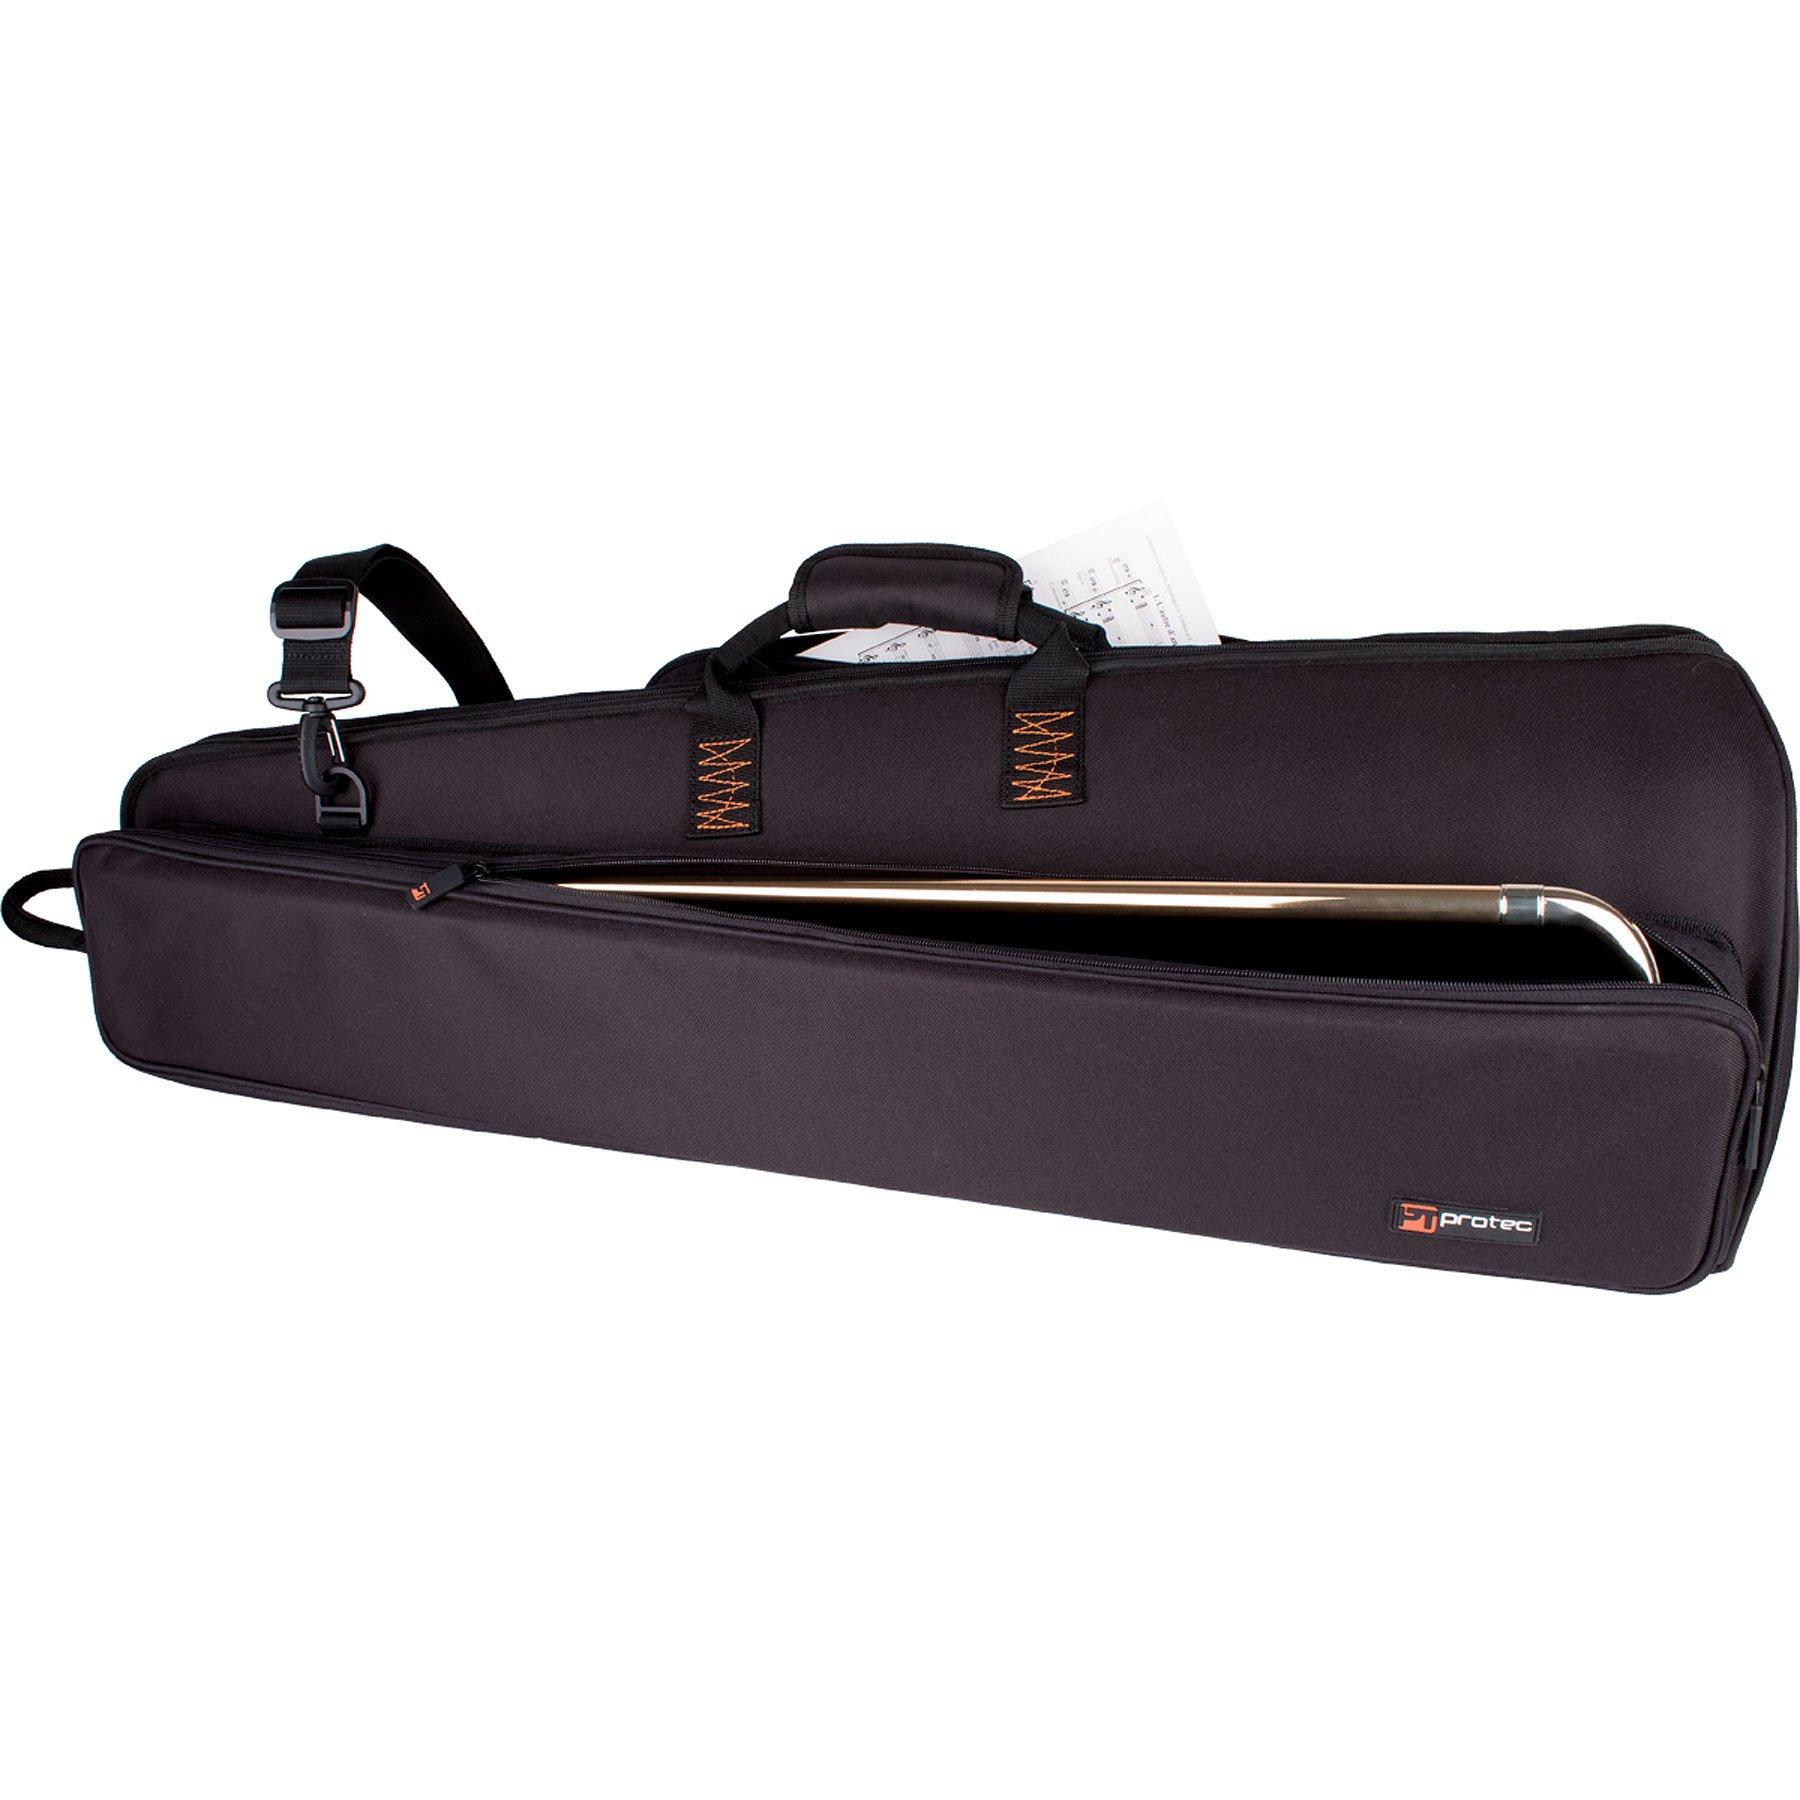 Pro Tec Trombone Explorer Gig Bag with Sheet Music Pocket (C239X)